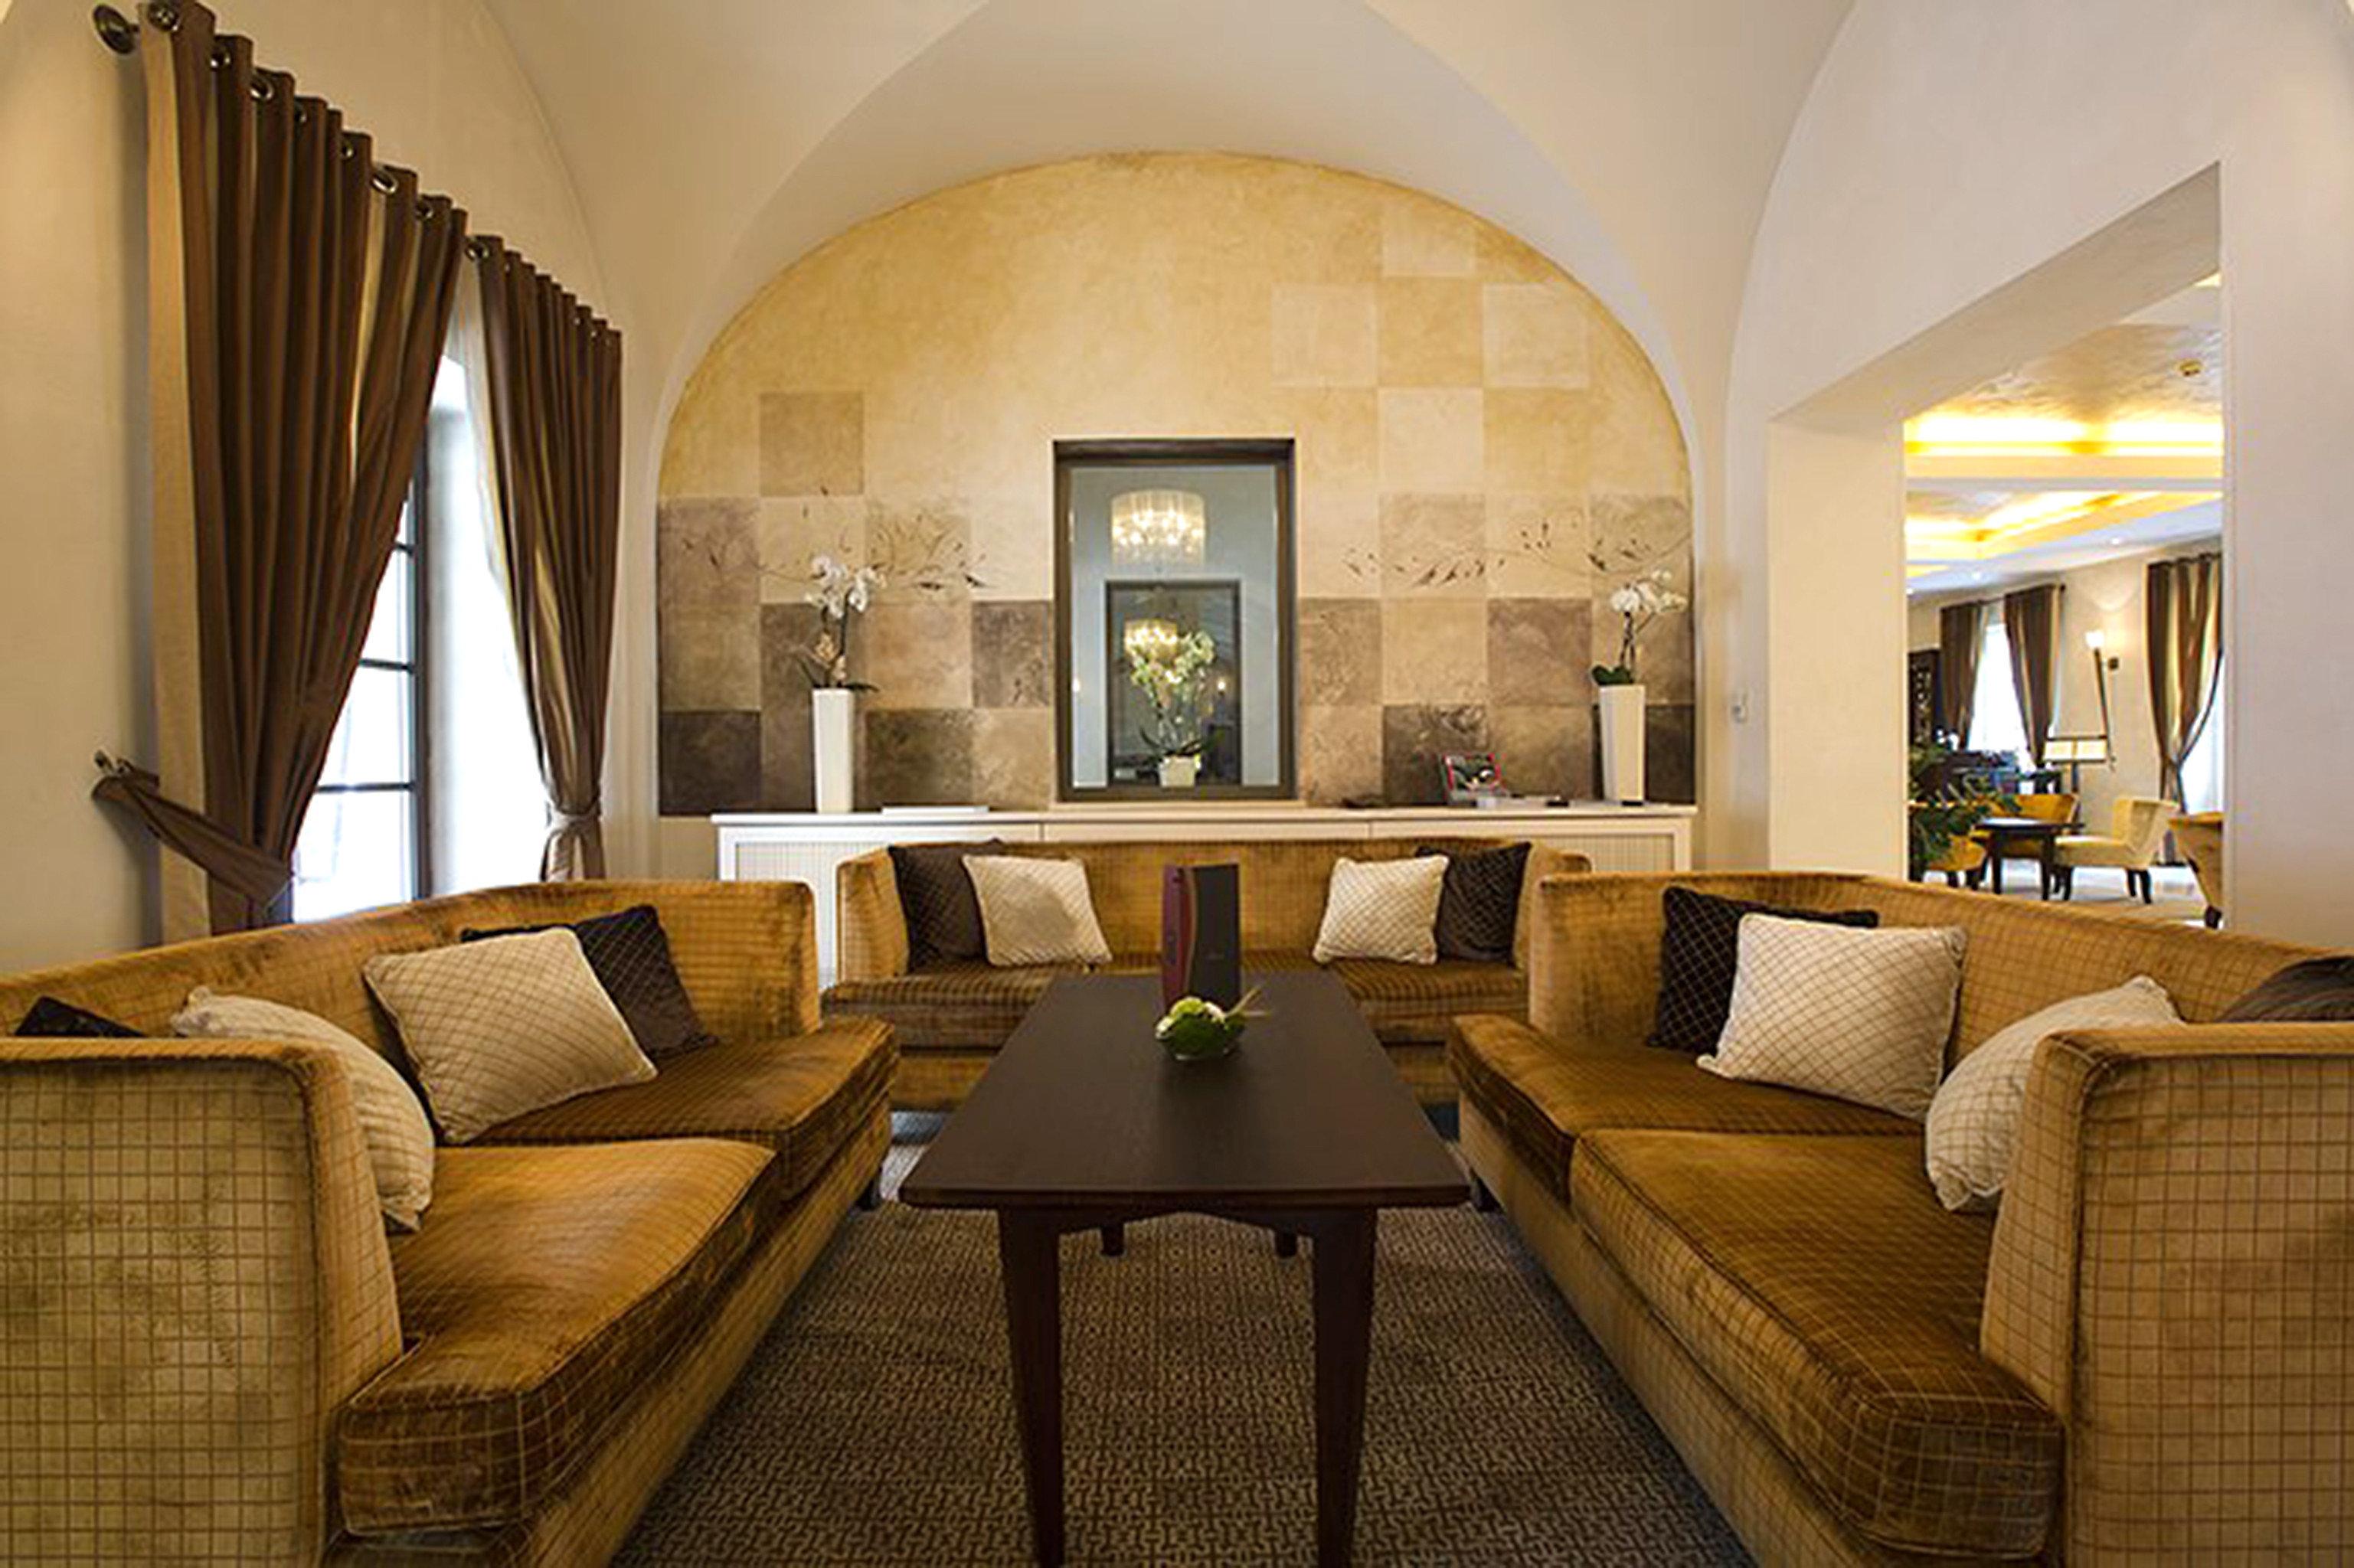 Historic Lobby Lounge chair property living room Suite home condominium mansion Villa tan